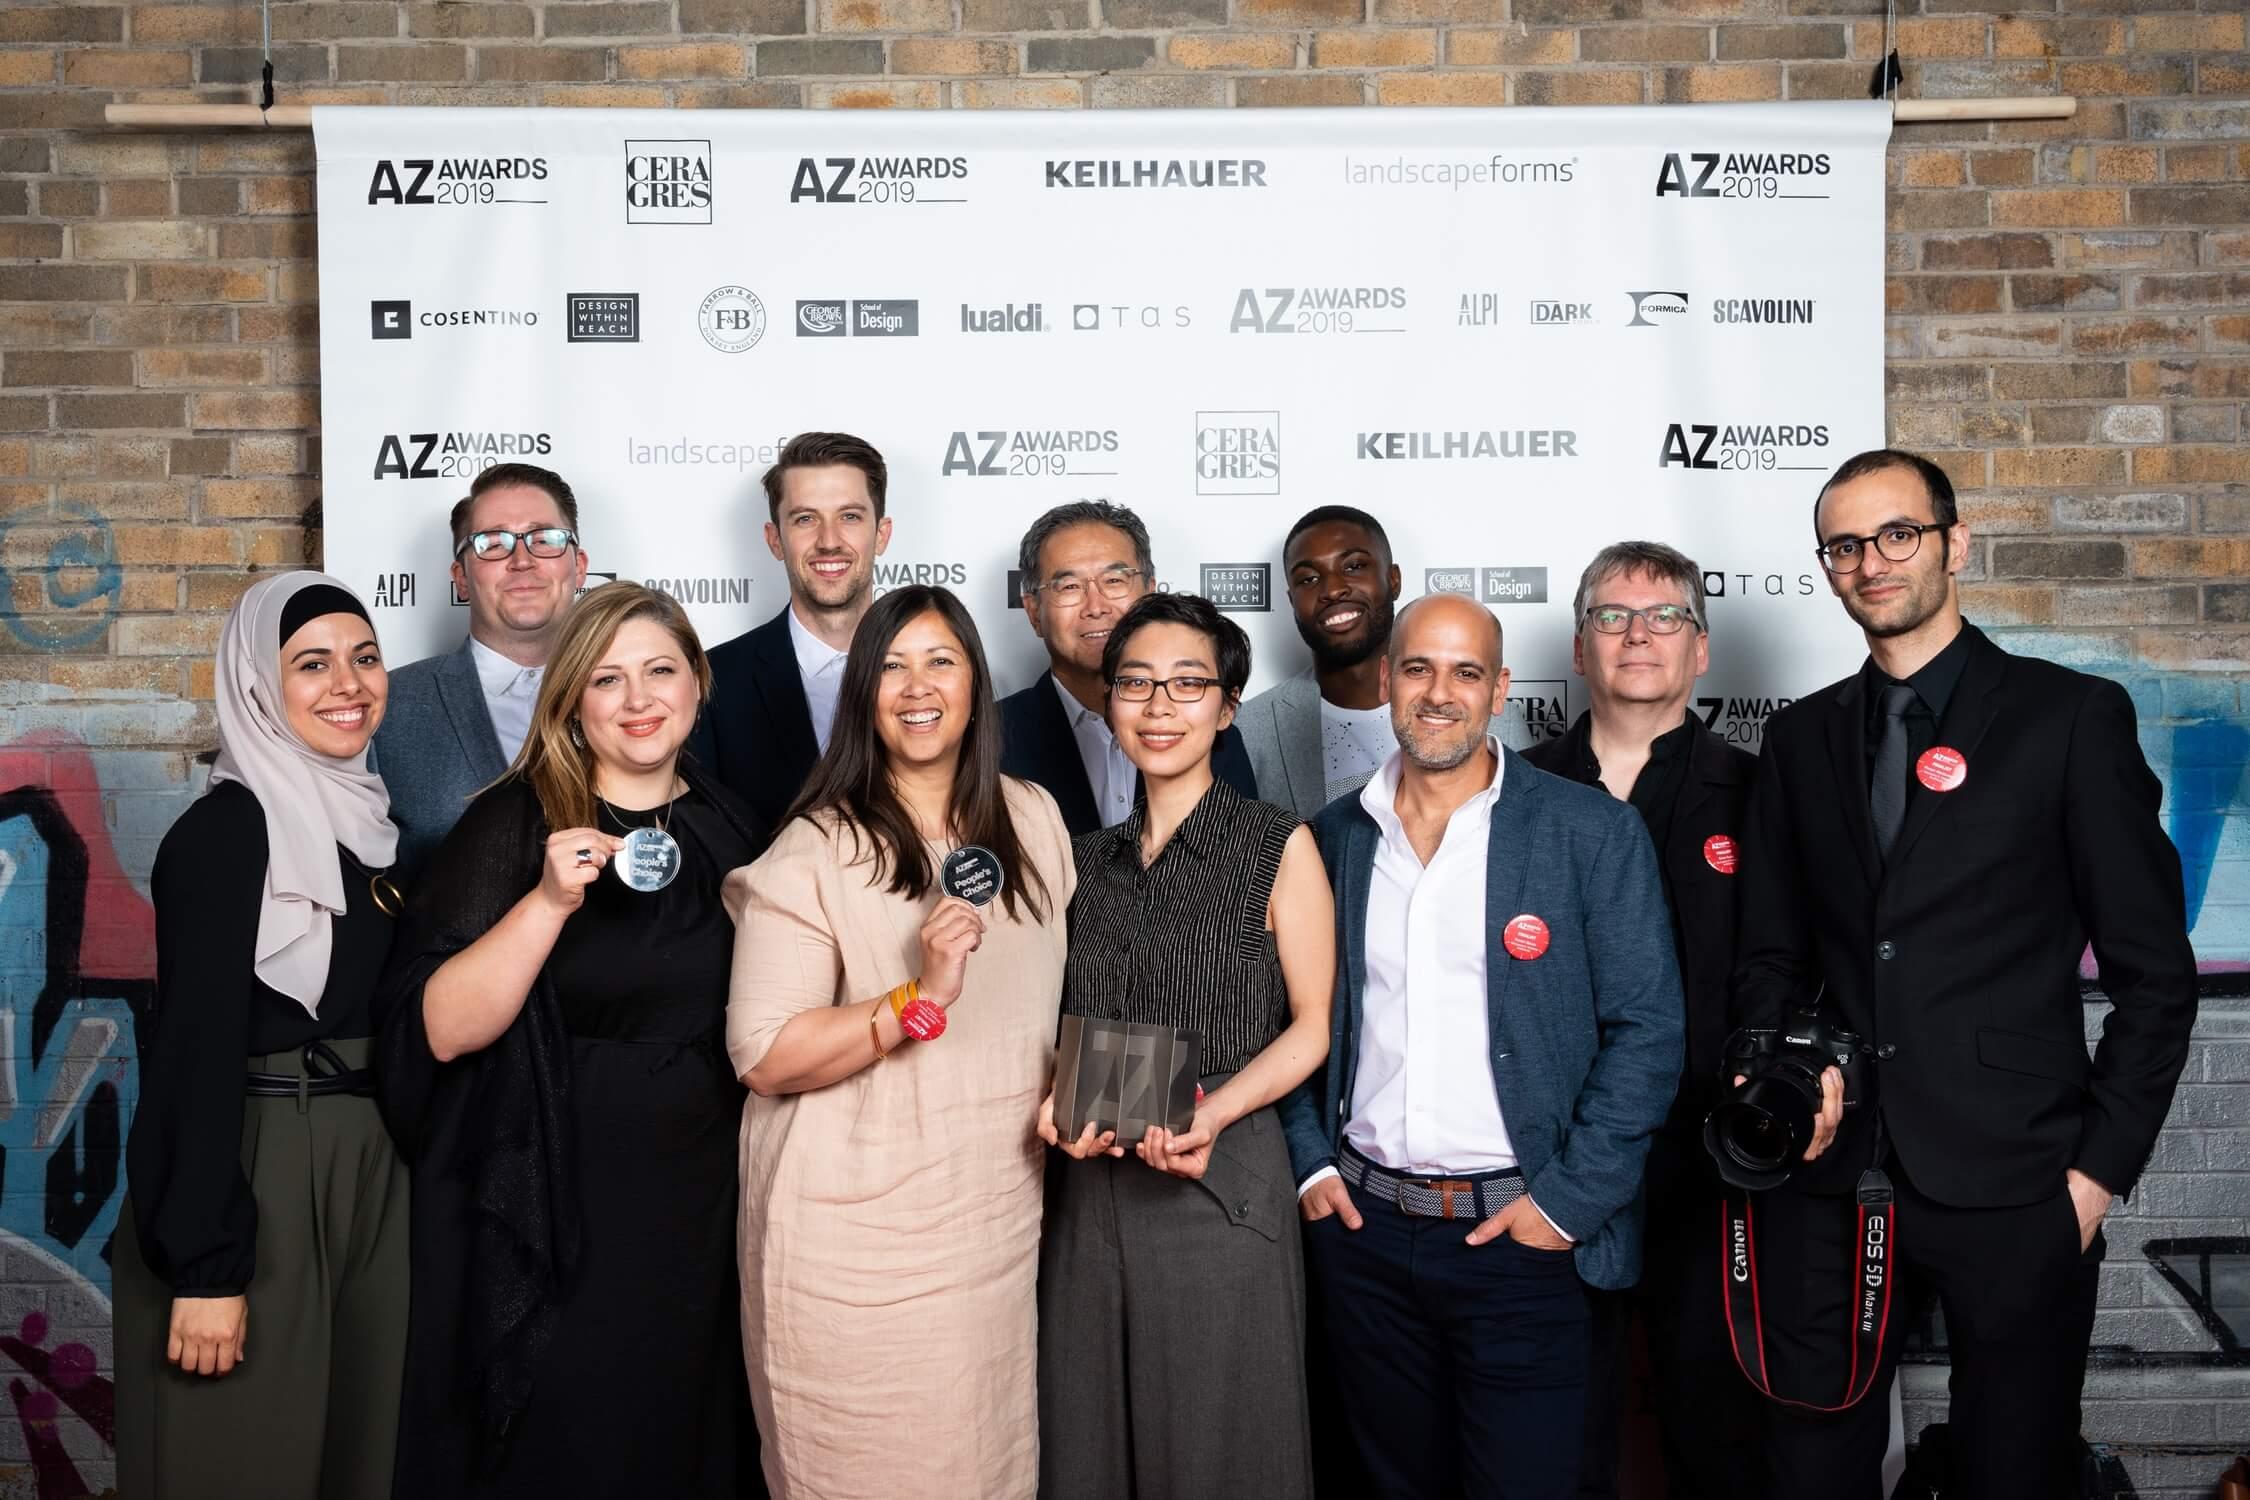 Moriyama & Teshima's full team, celebrating their win for The Arbour, AZ Awards 2019: Scenes from the Gala